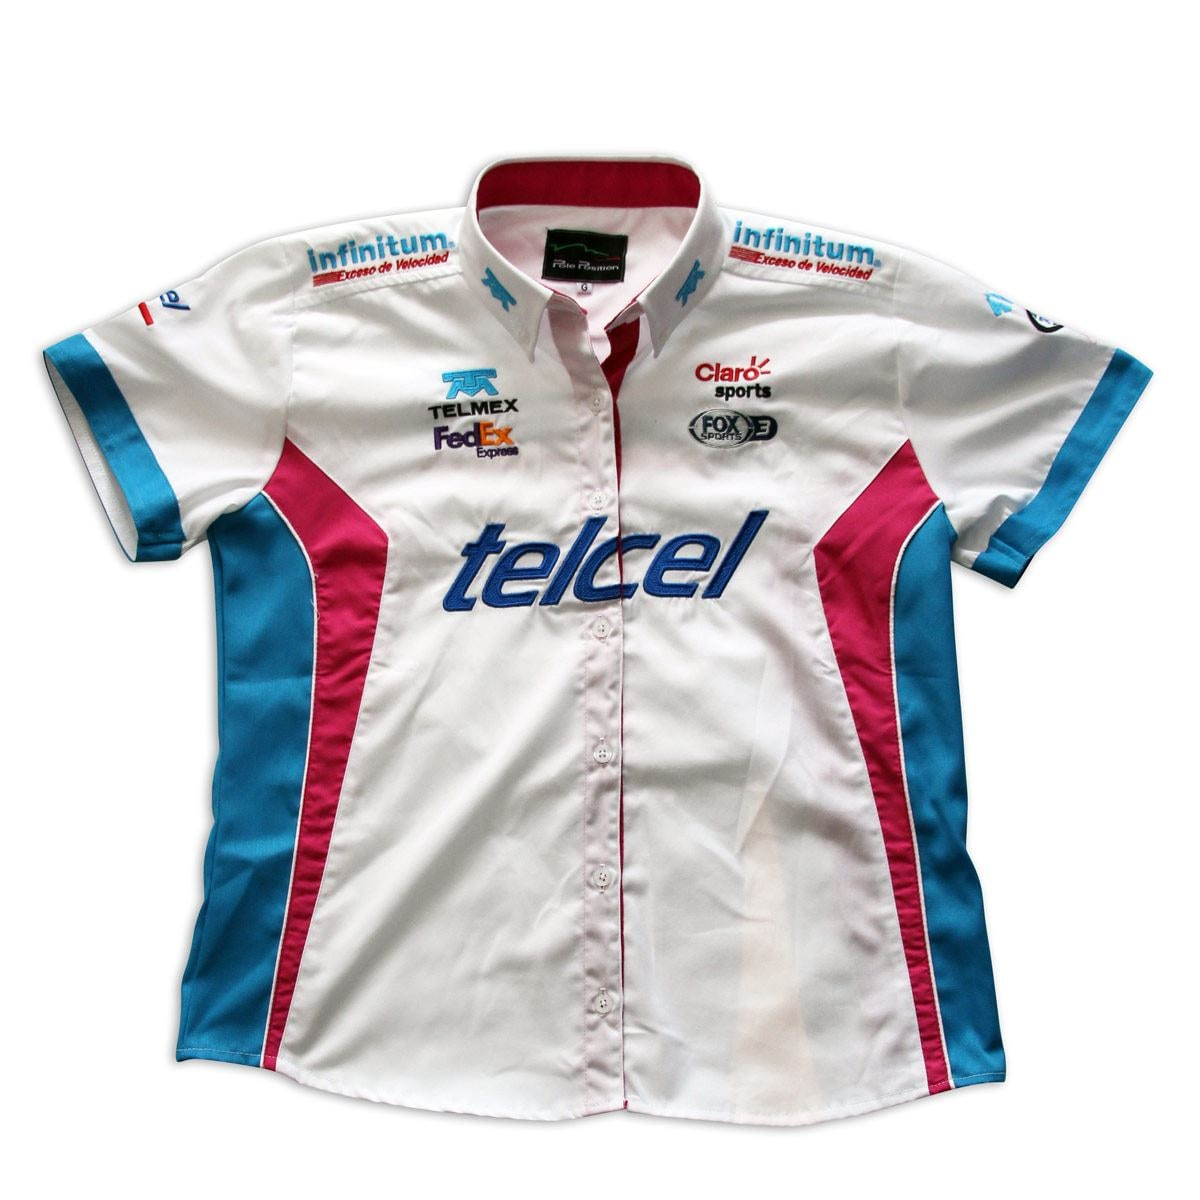 Camisa Pole Position Escuderia Telmex-Telcel Dama 2019 mediana